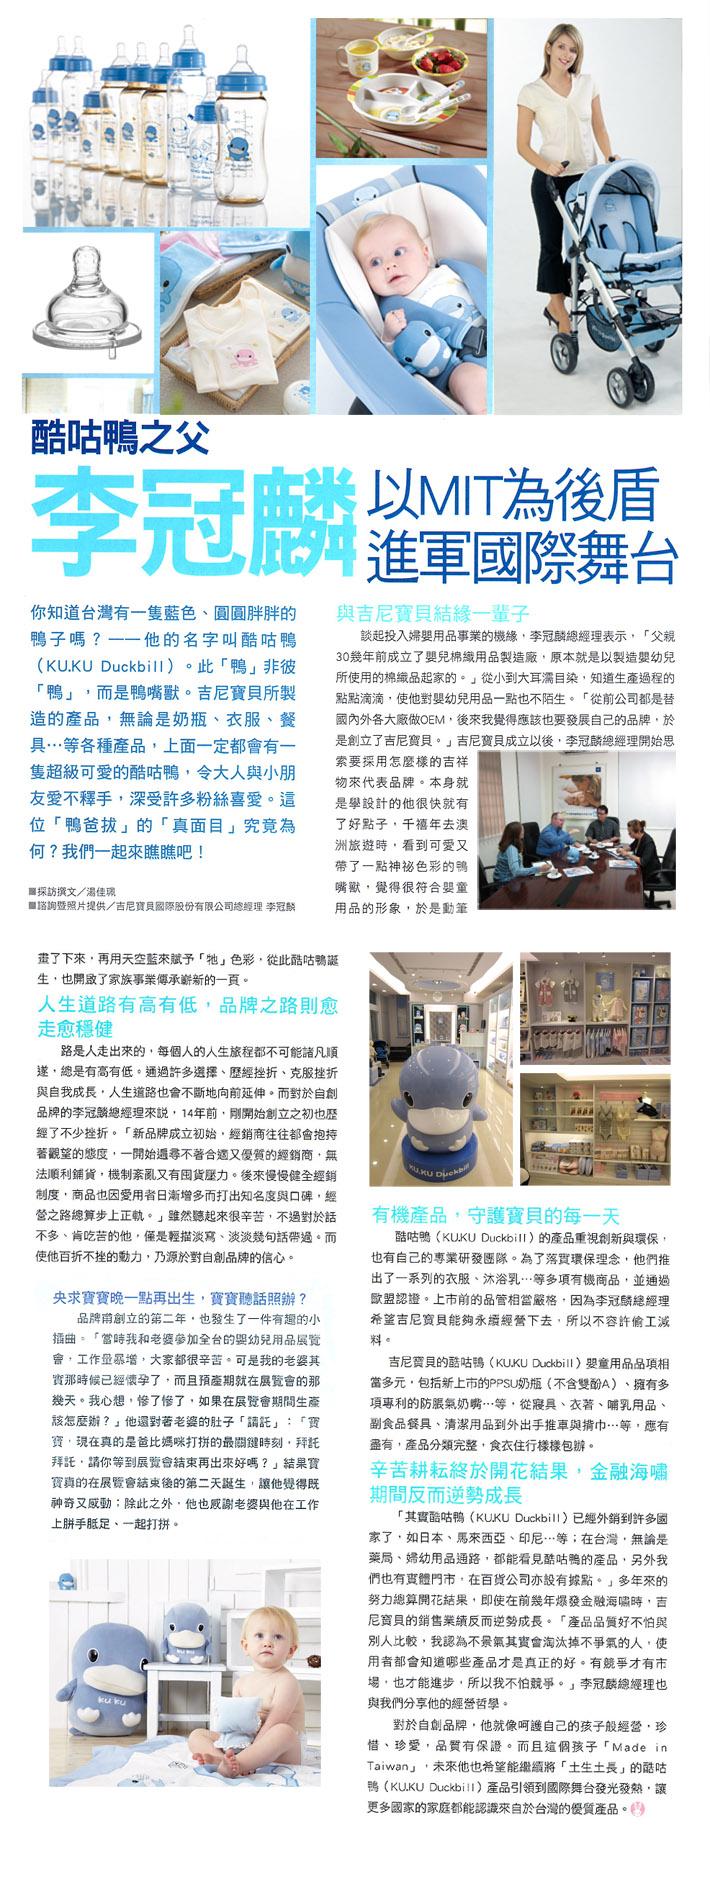 proimages/company/news-03a.jpg